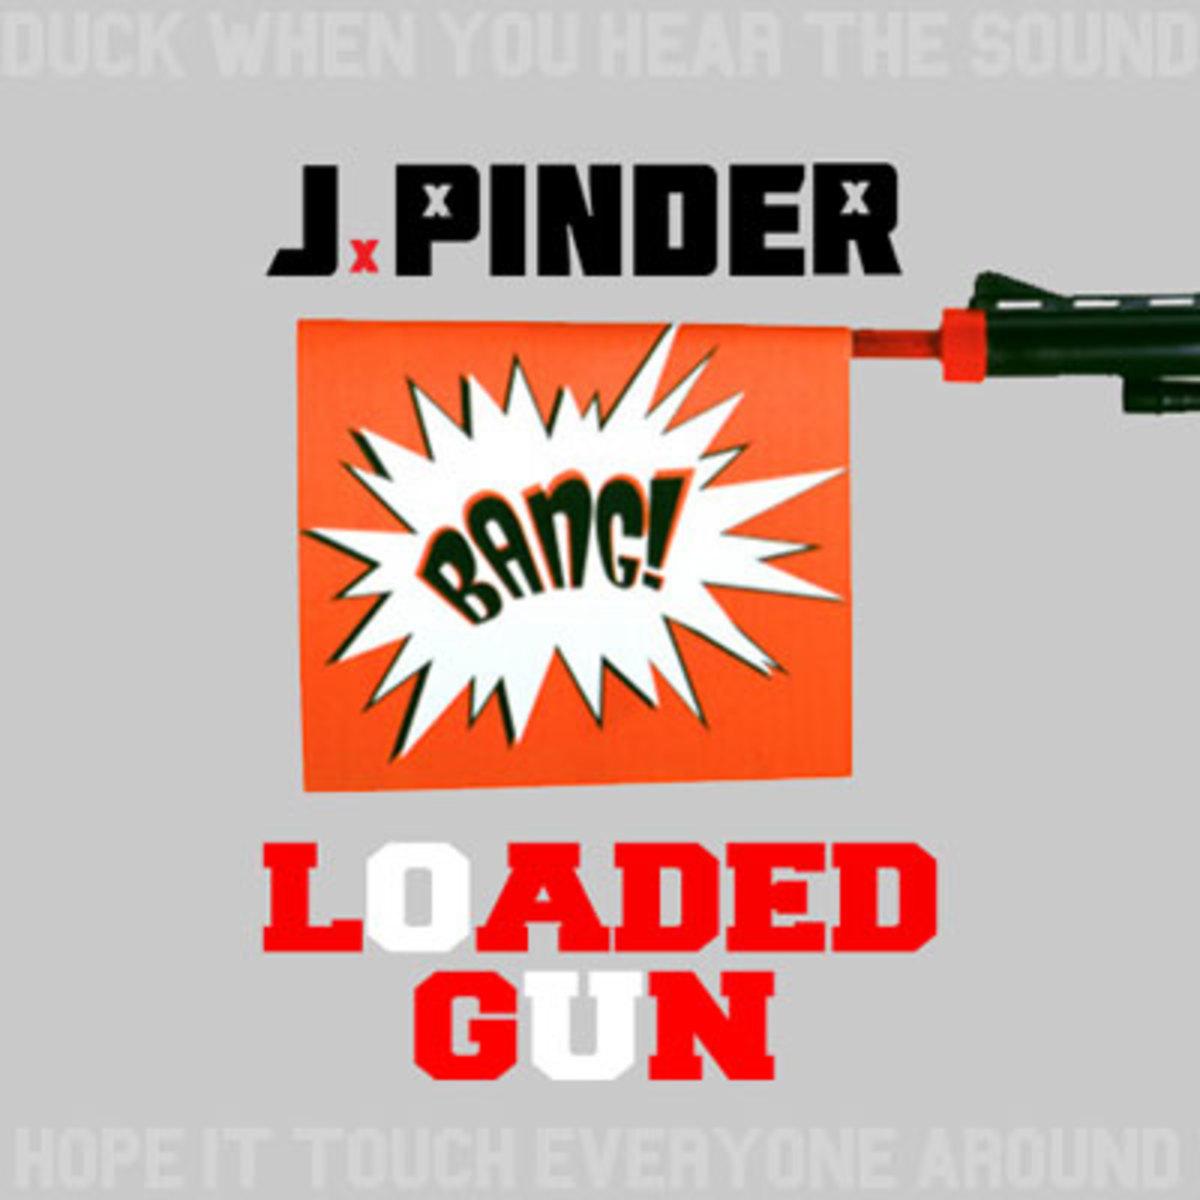 jpinder-loadedgun.jpg